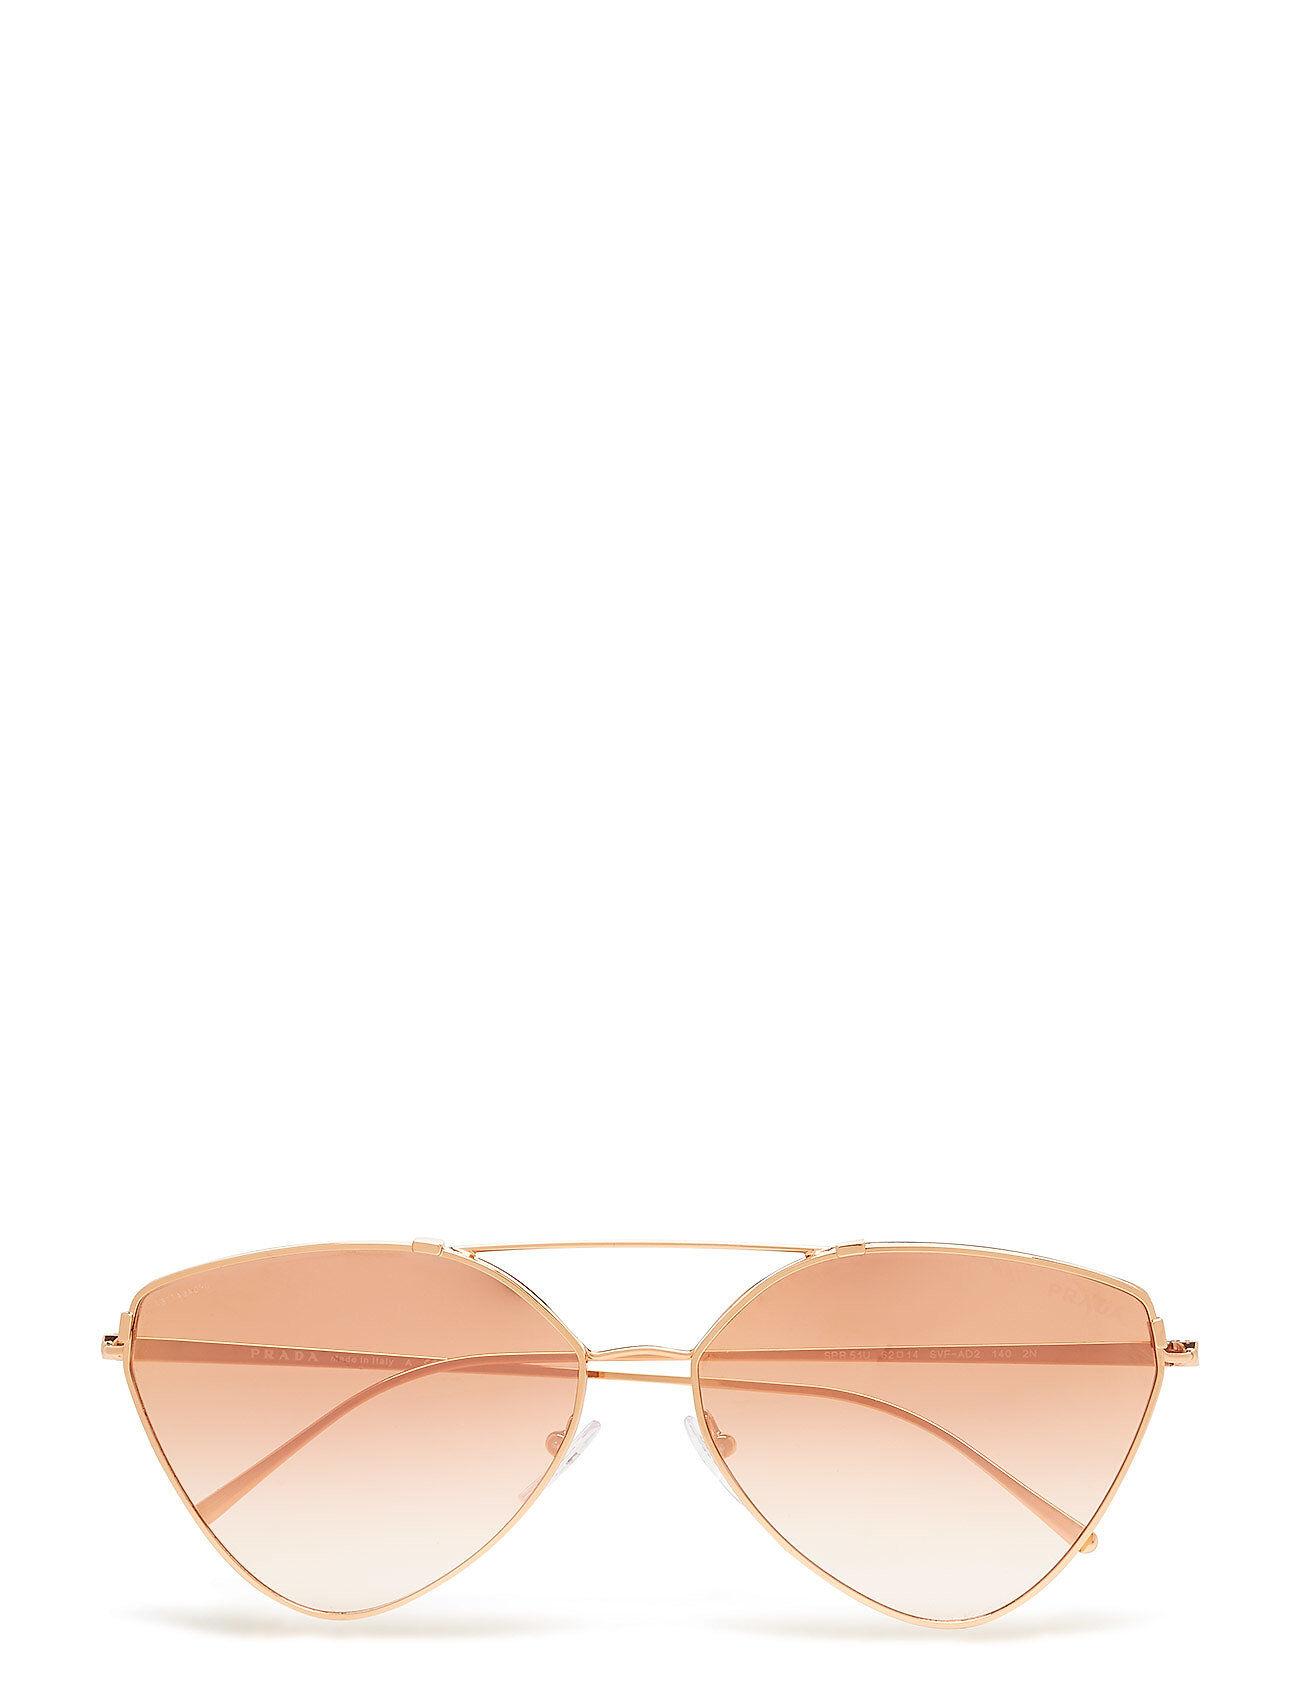 Image of Prada Sunglasses Women'S Sunglasses Neliönmuotoiset Aurinkolasit Kulta Prada Sunglasses